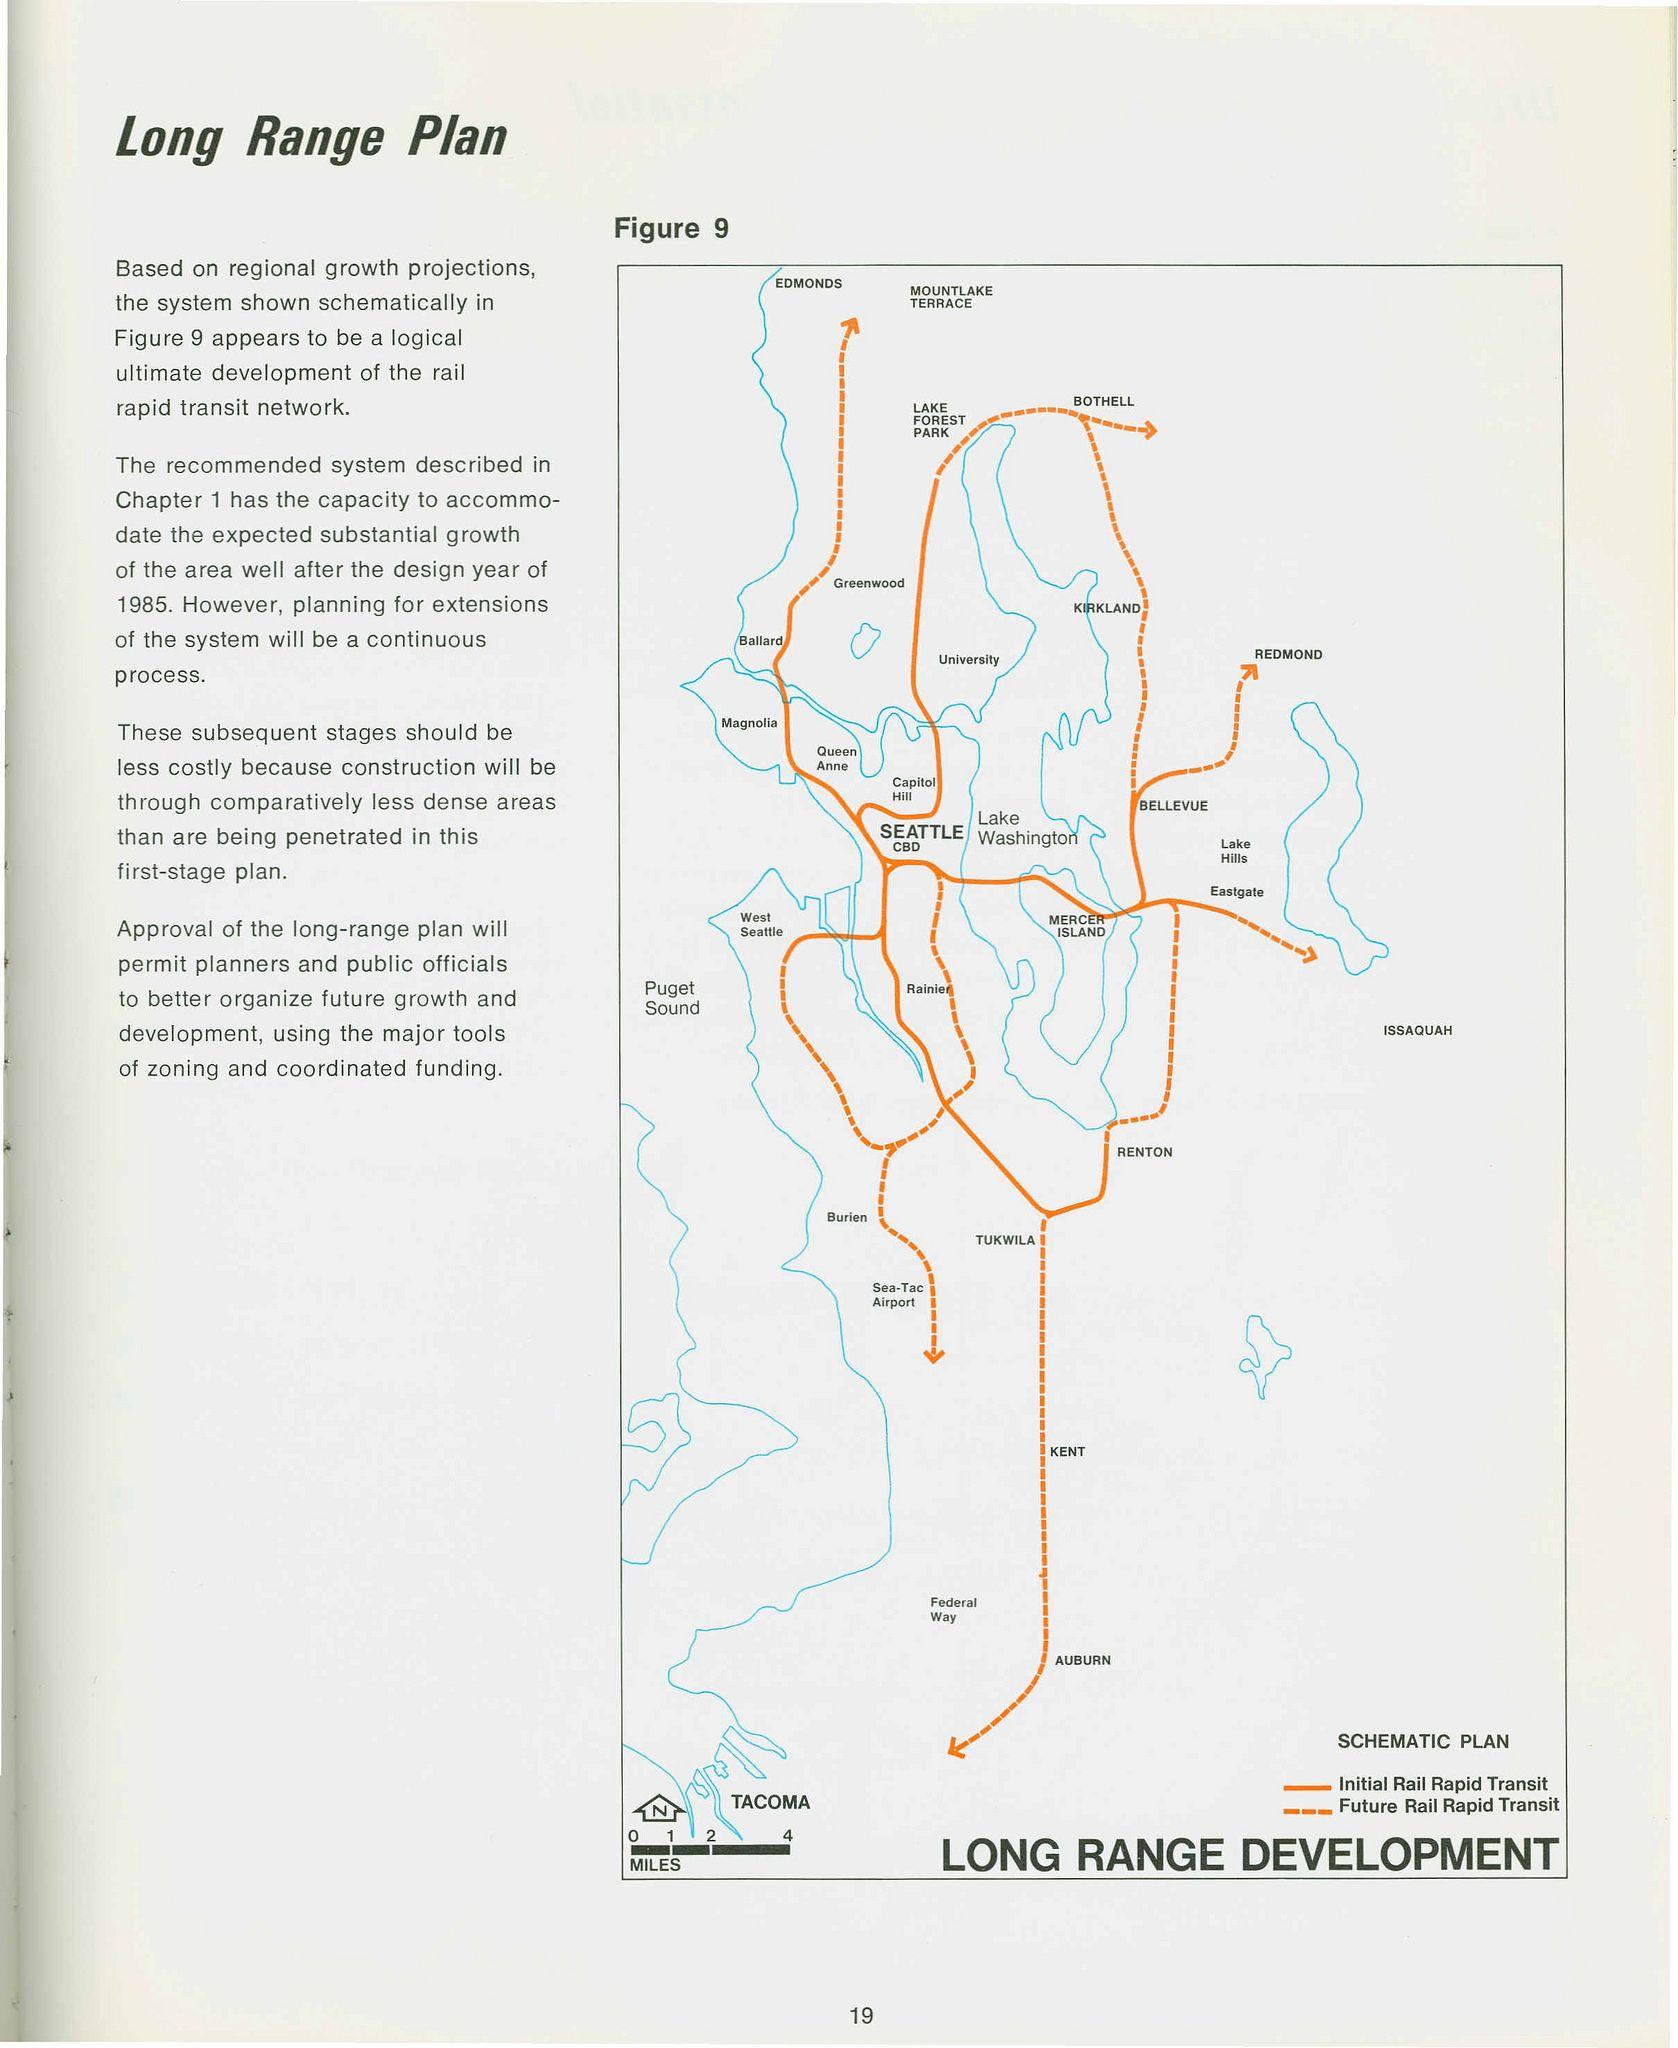 Figure 9 Long Range Development With Images Development Rapid Transit Light Rail